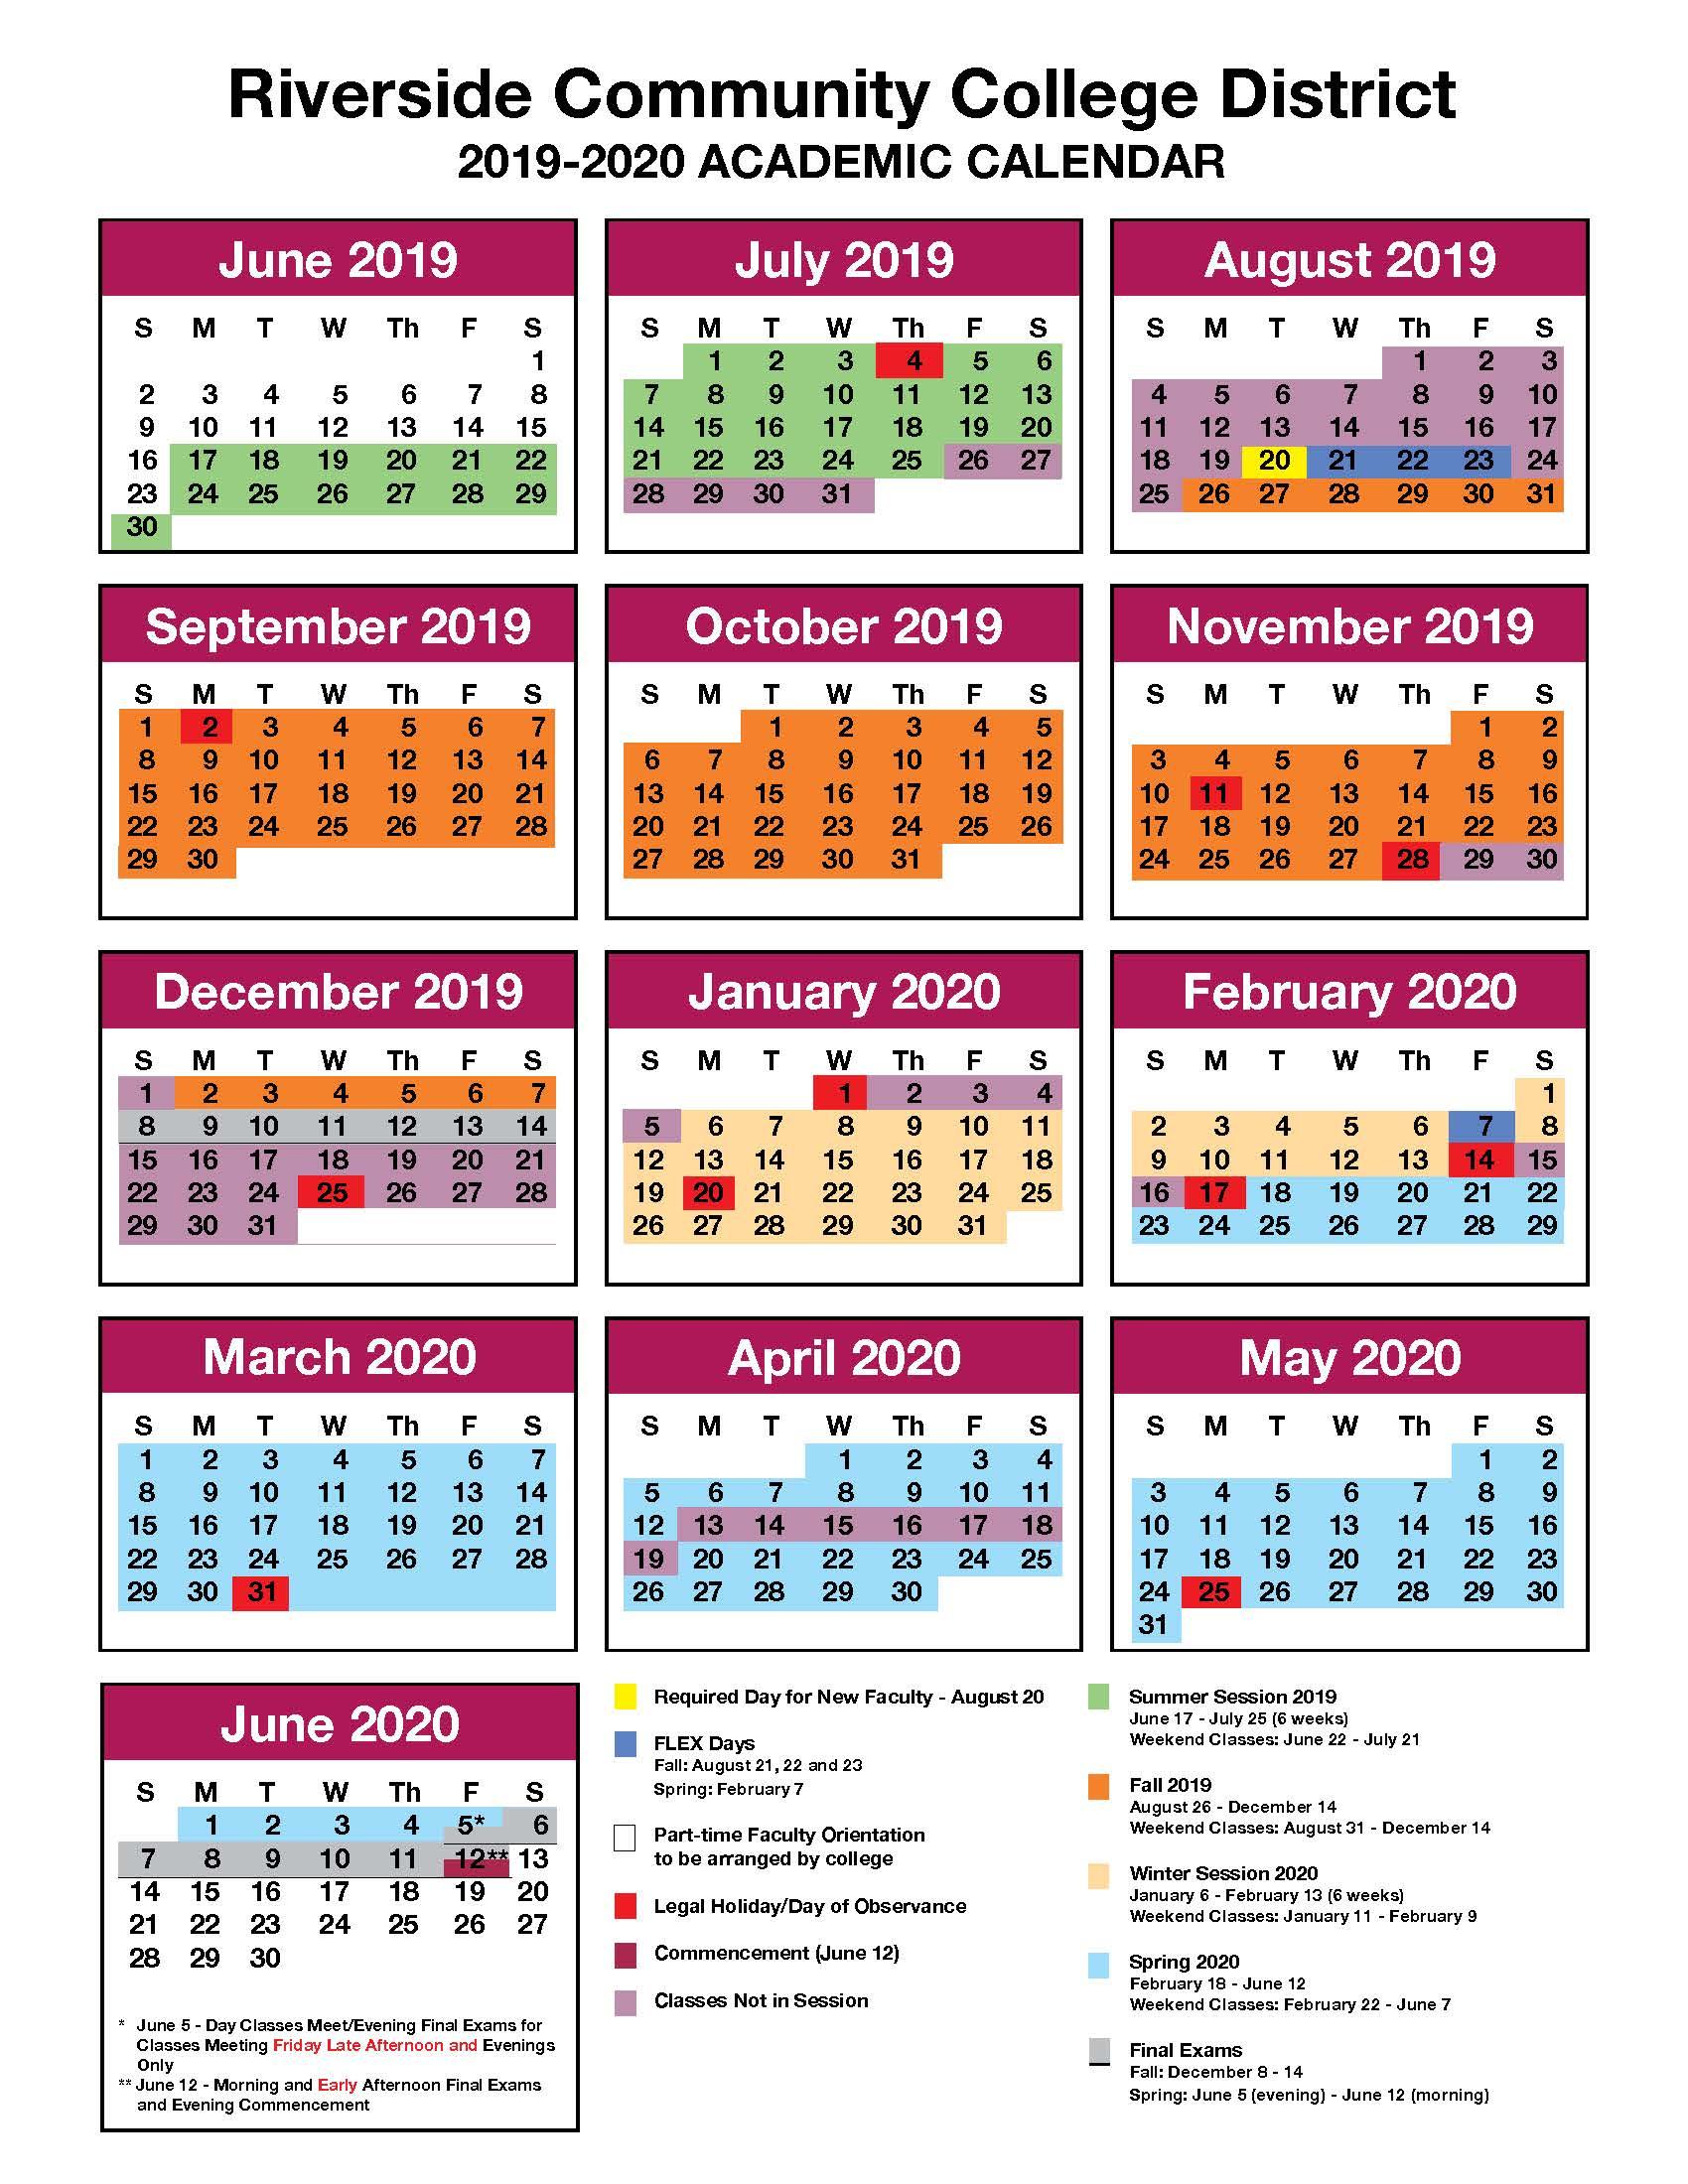 Jfk And Norco College Calendar 2019 2020 - John F. Kennedy For Norco School District Calendar